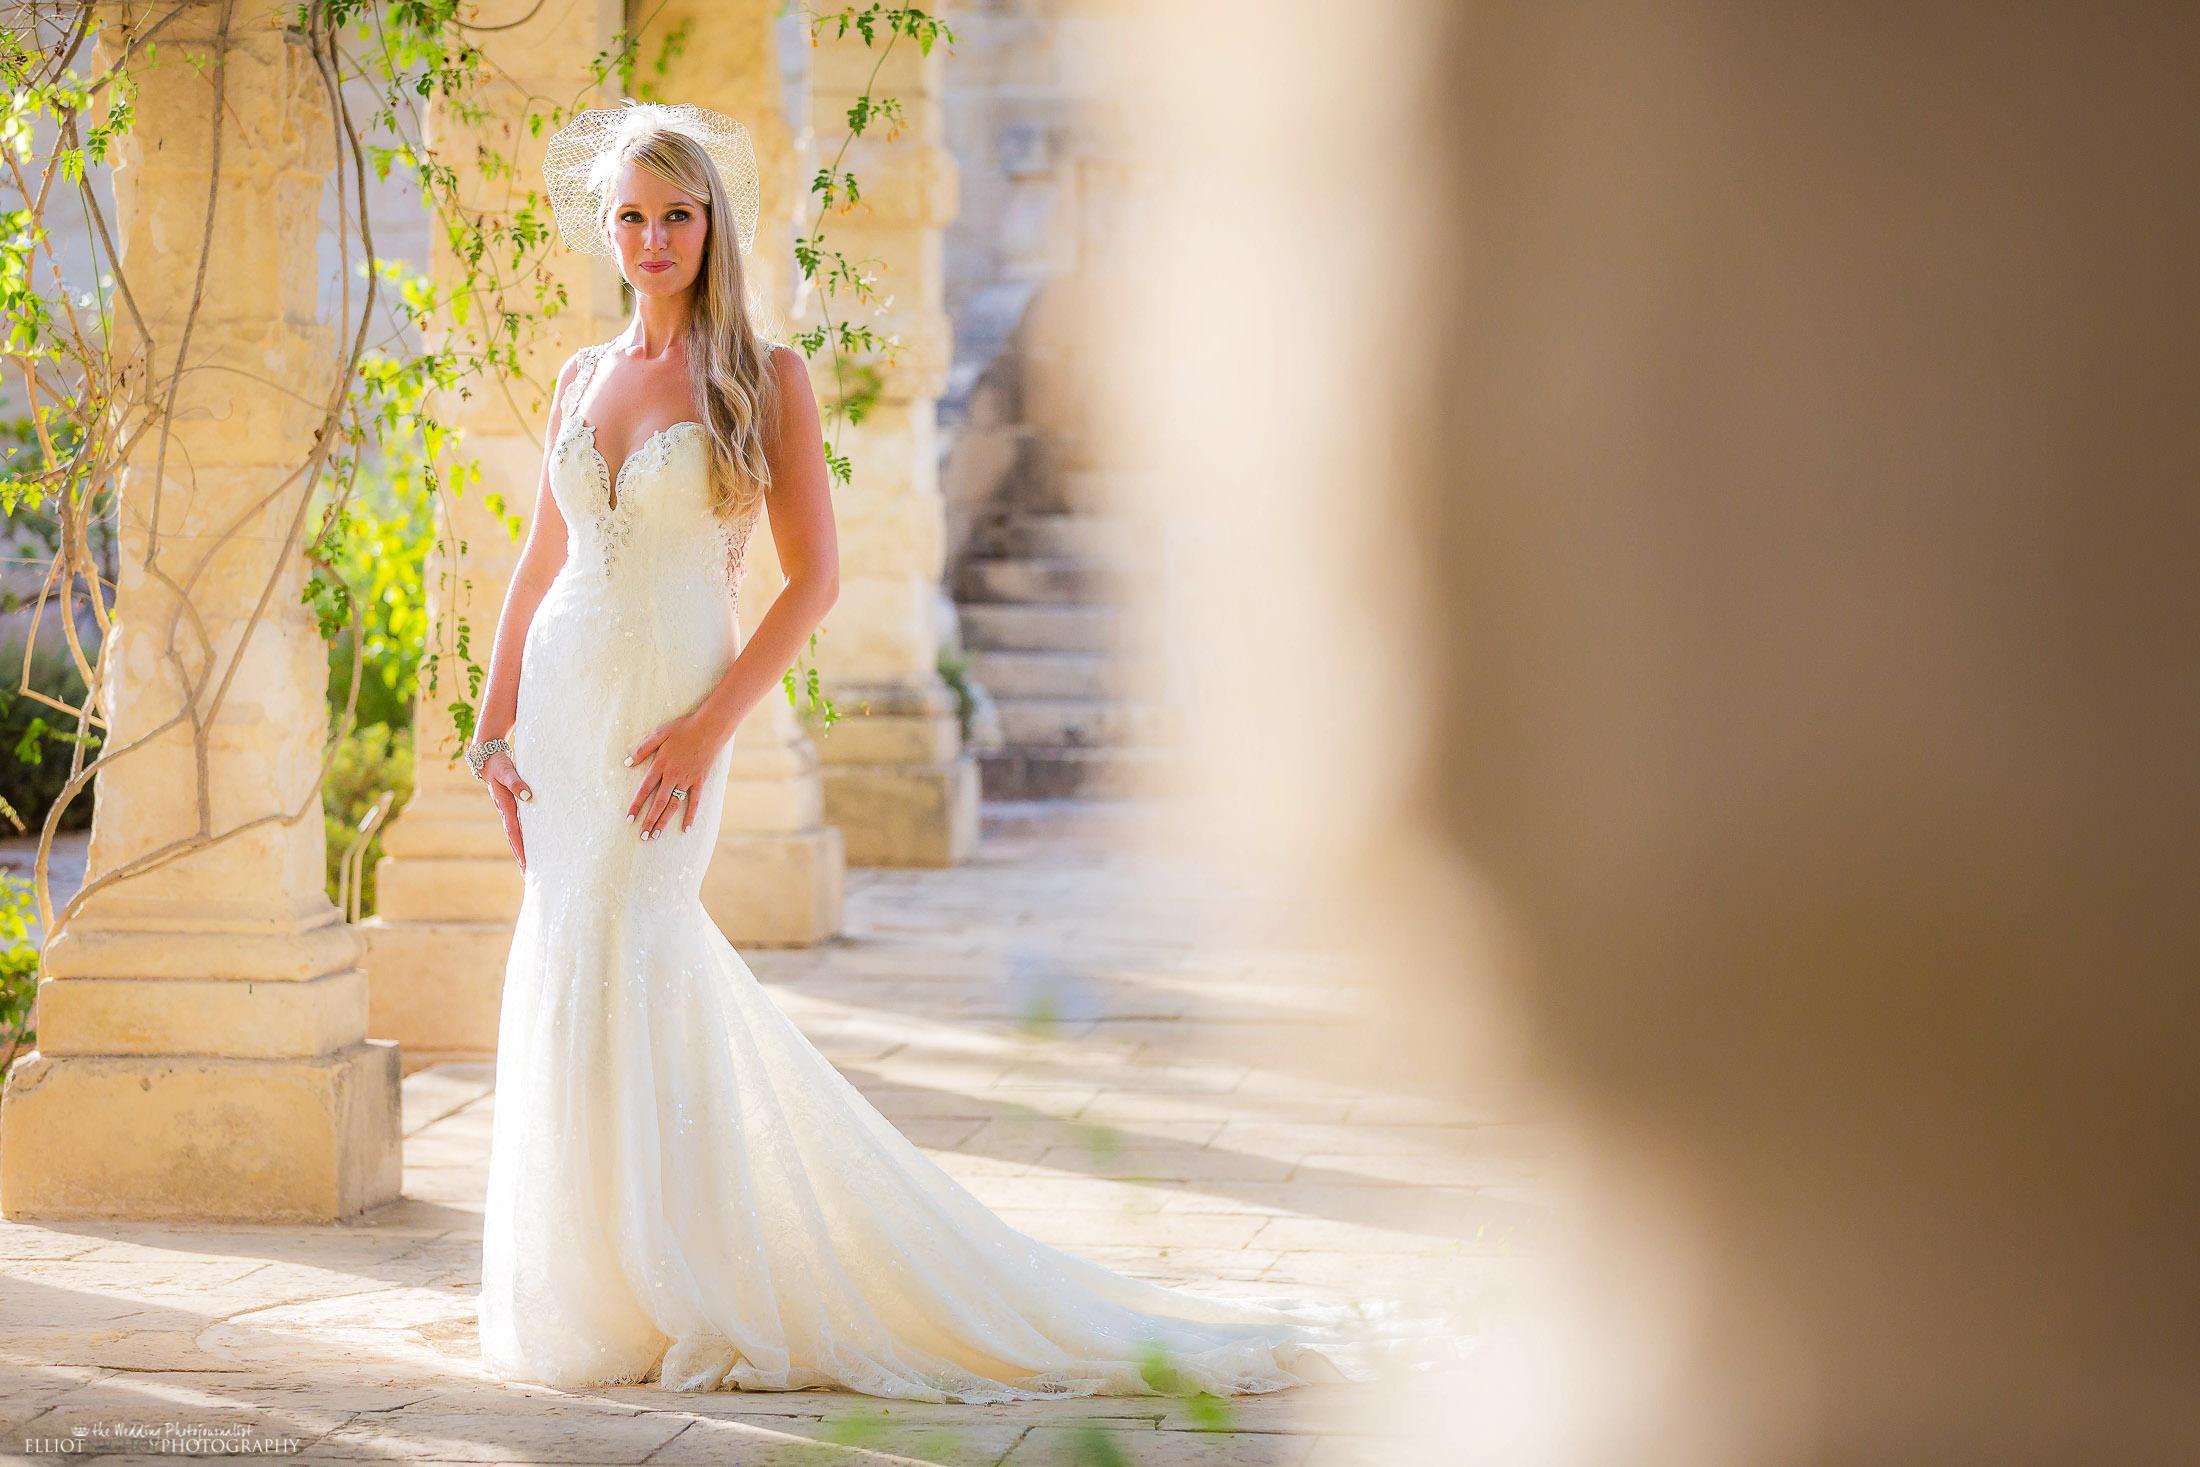 Portrait of the bride. Photo by Elliot Nichol Photography.